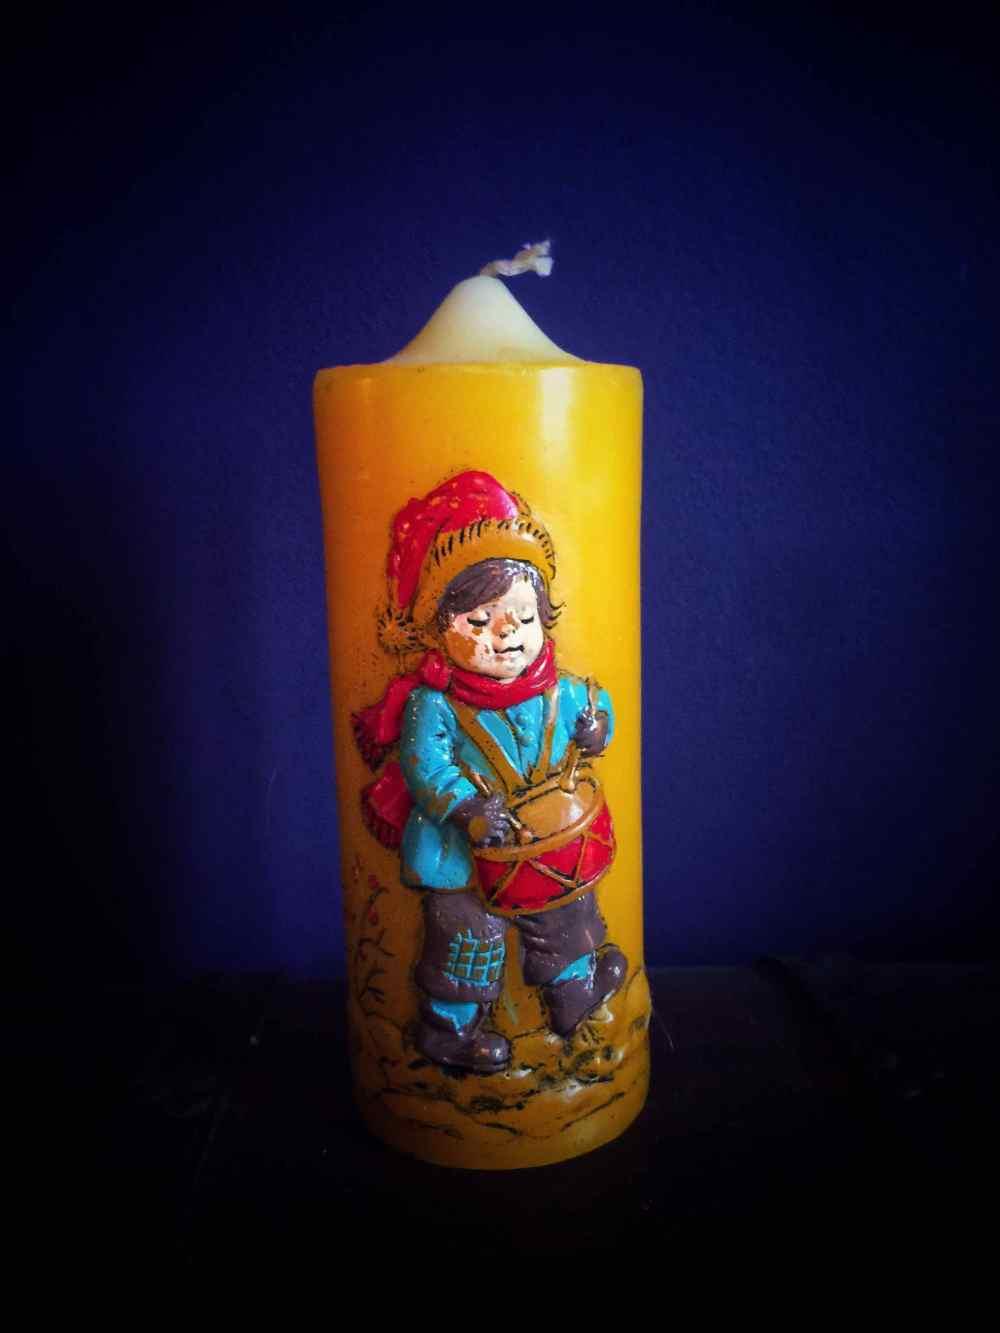 The little drummer boy vintage candle